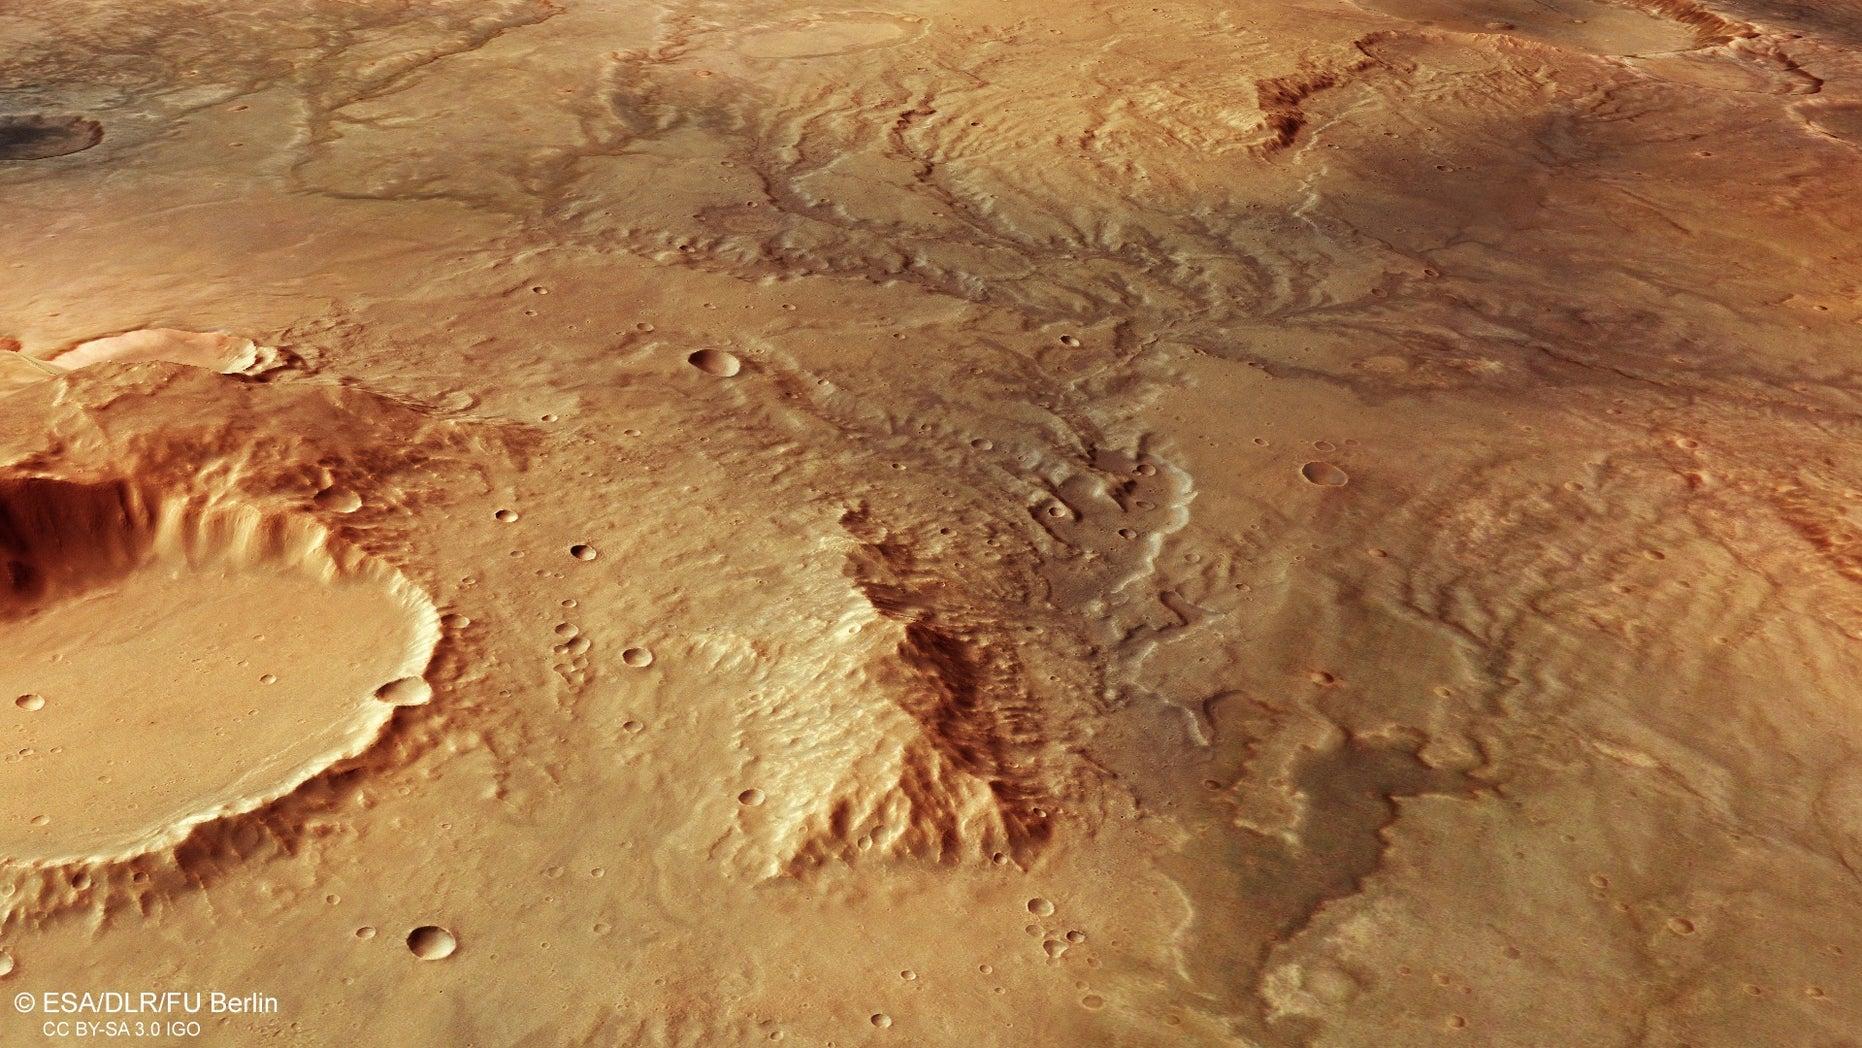 Mars had rivers dotting its landscape billions of years ago.